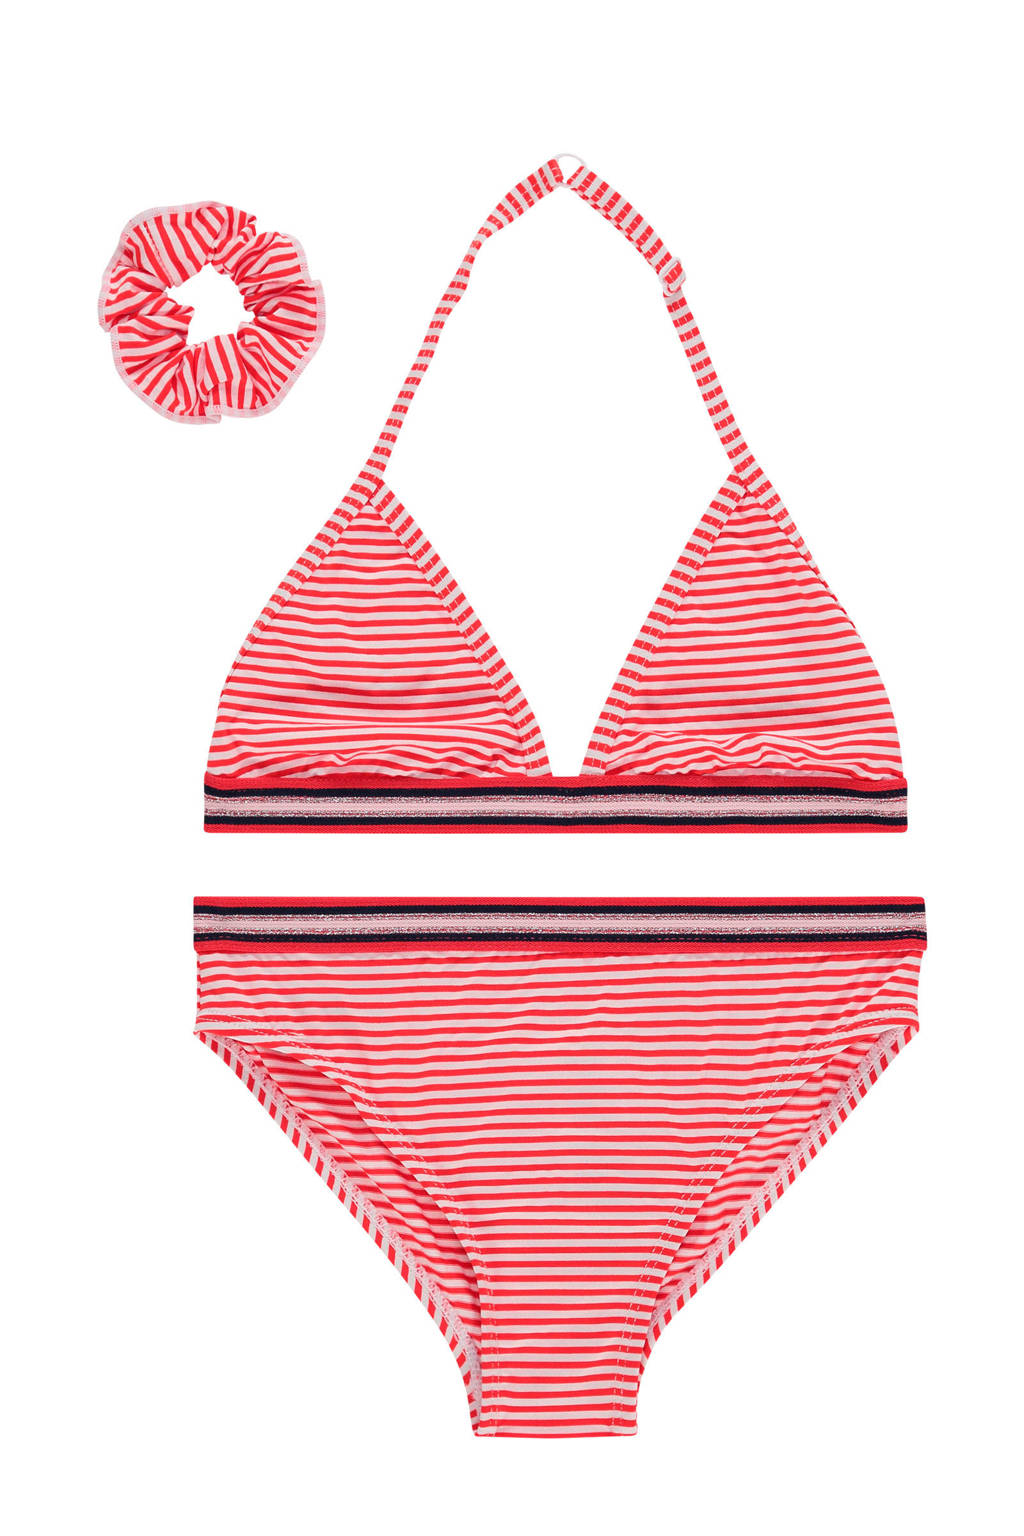 Vingino gestreepte triangel bikini Zetta + scrunchie roze/wit, Roze/wit